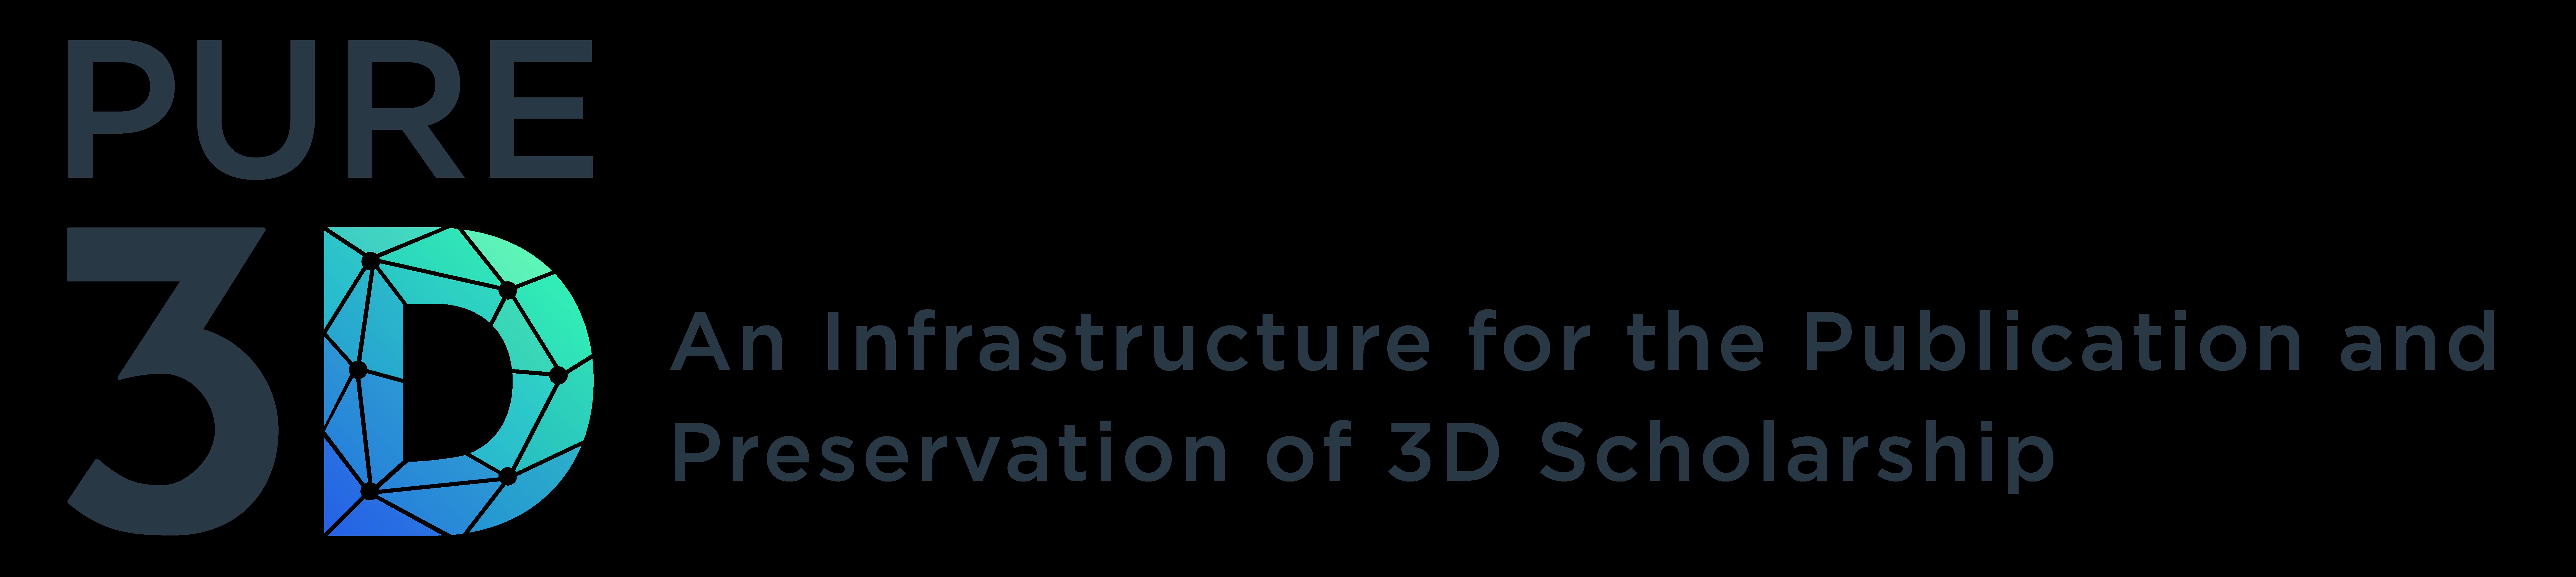 PURE3D Logo